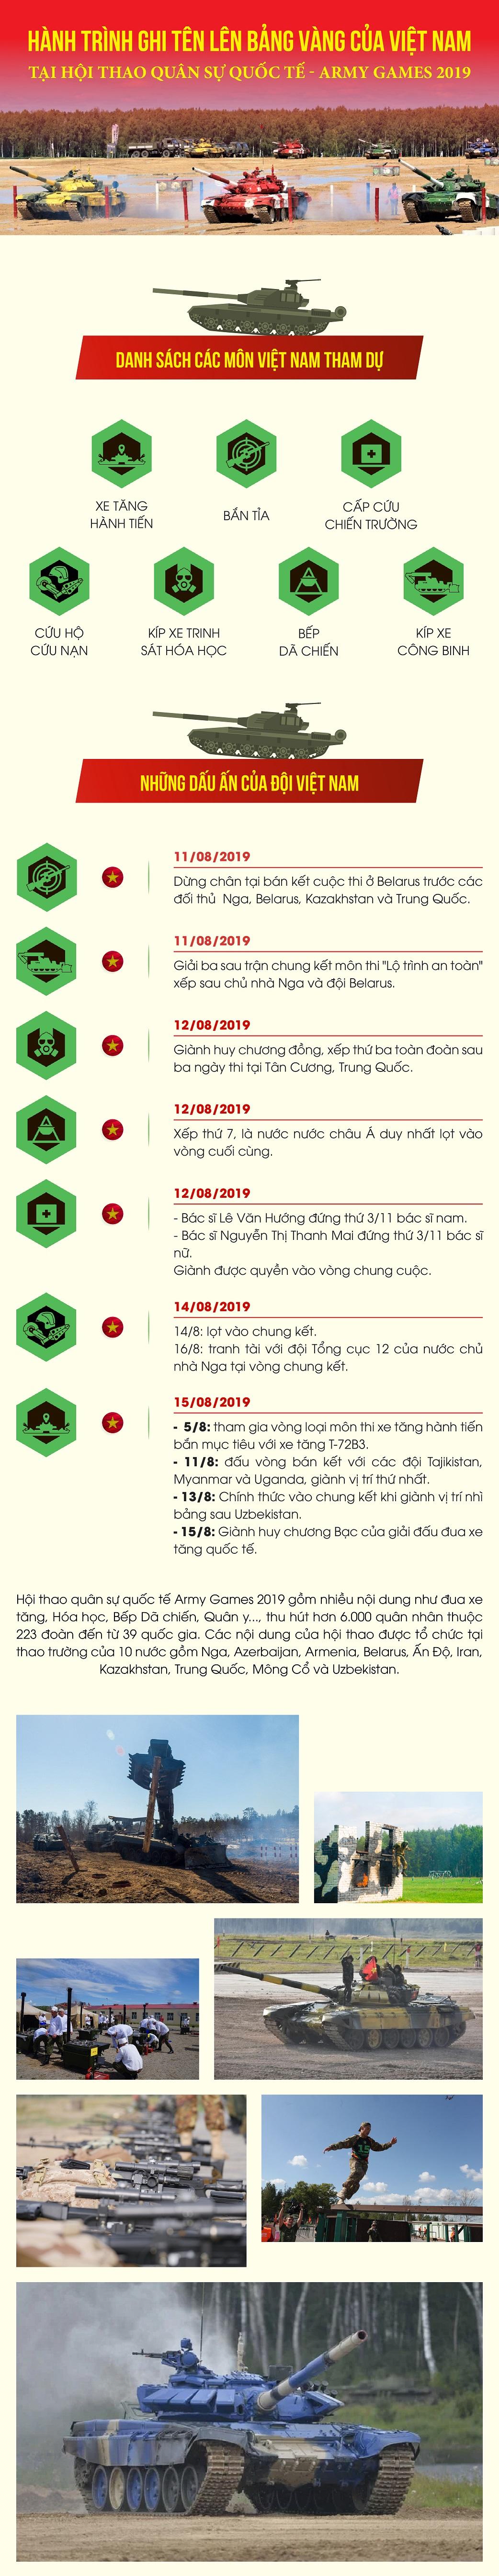 hanh-trinh-doan-viet-nam-tai-hoi-thao-quan-su-quoc-te-army-games-2019